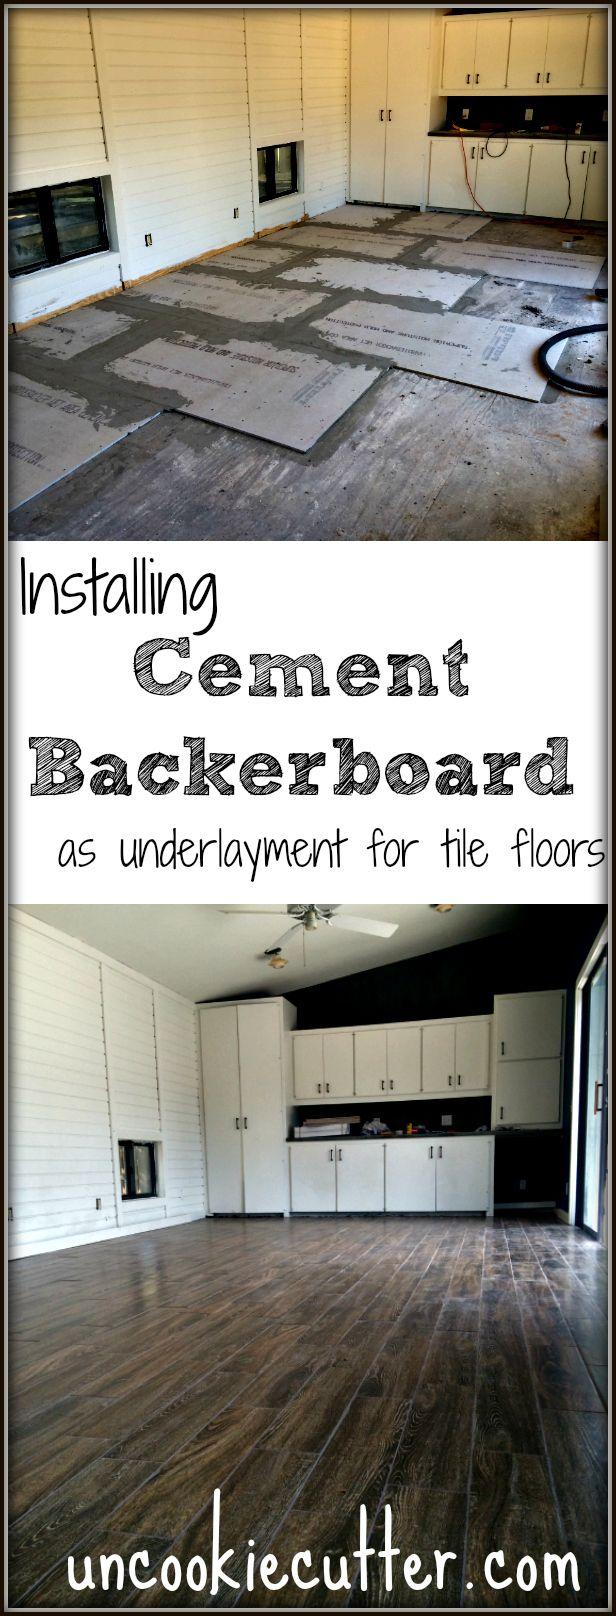 Cement backerboard floor tile installation tile for Cement tile installation